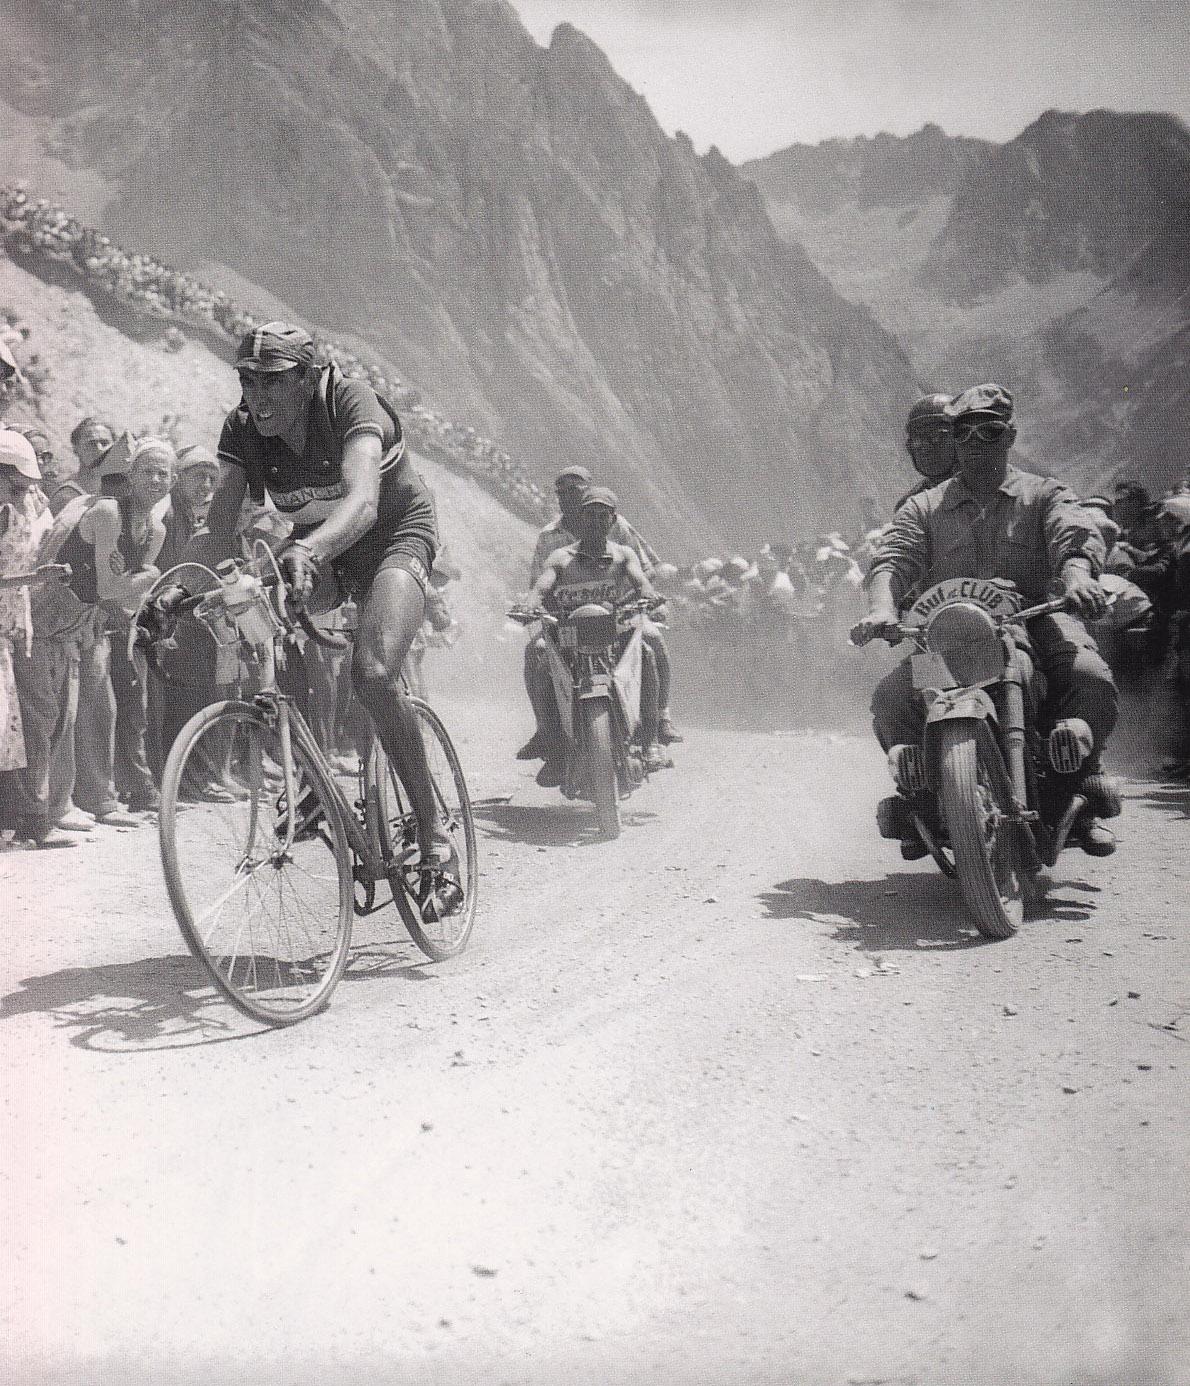 coppi-stage11-pau-luchon-1949